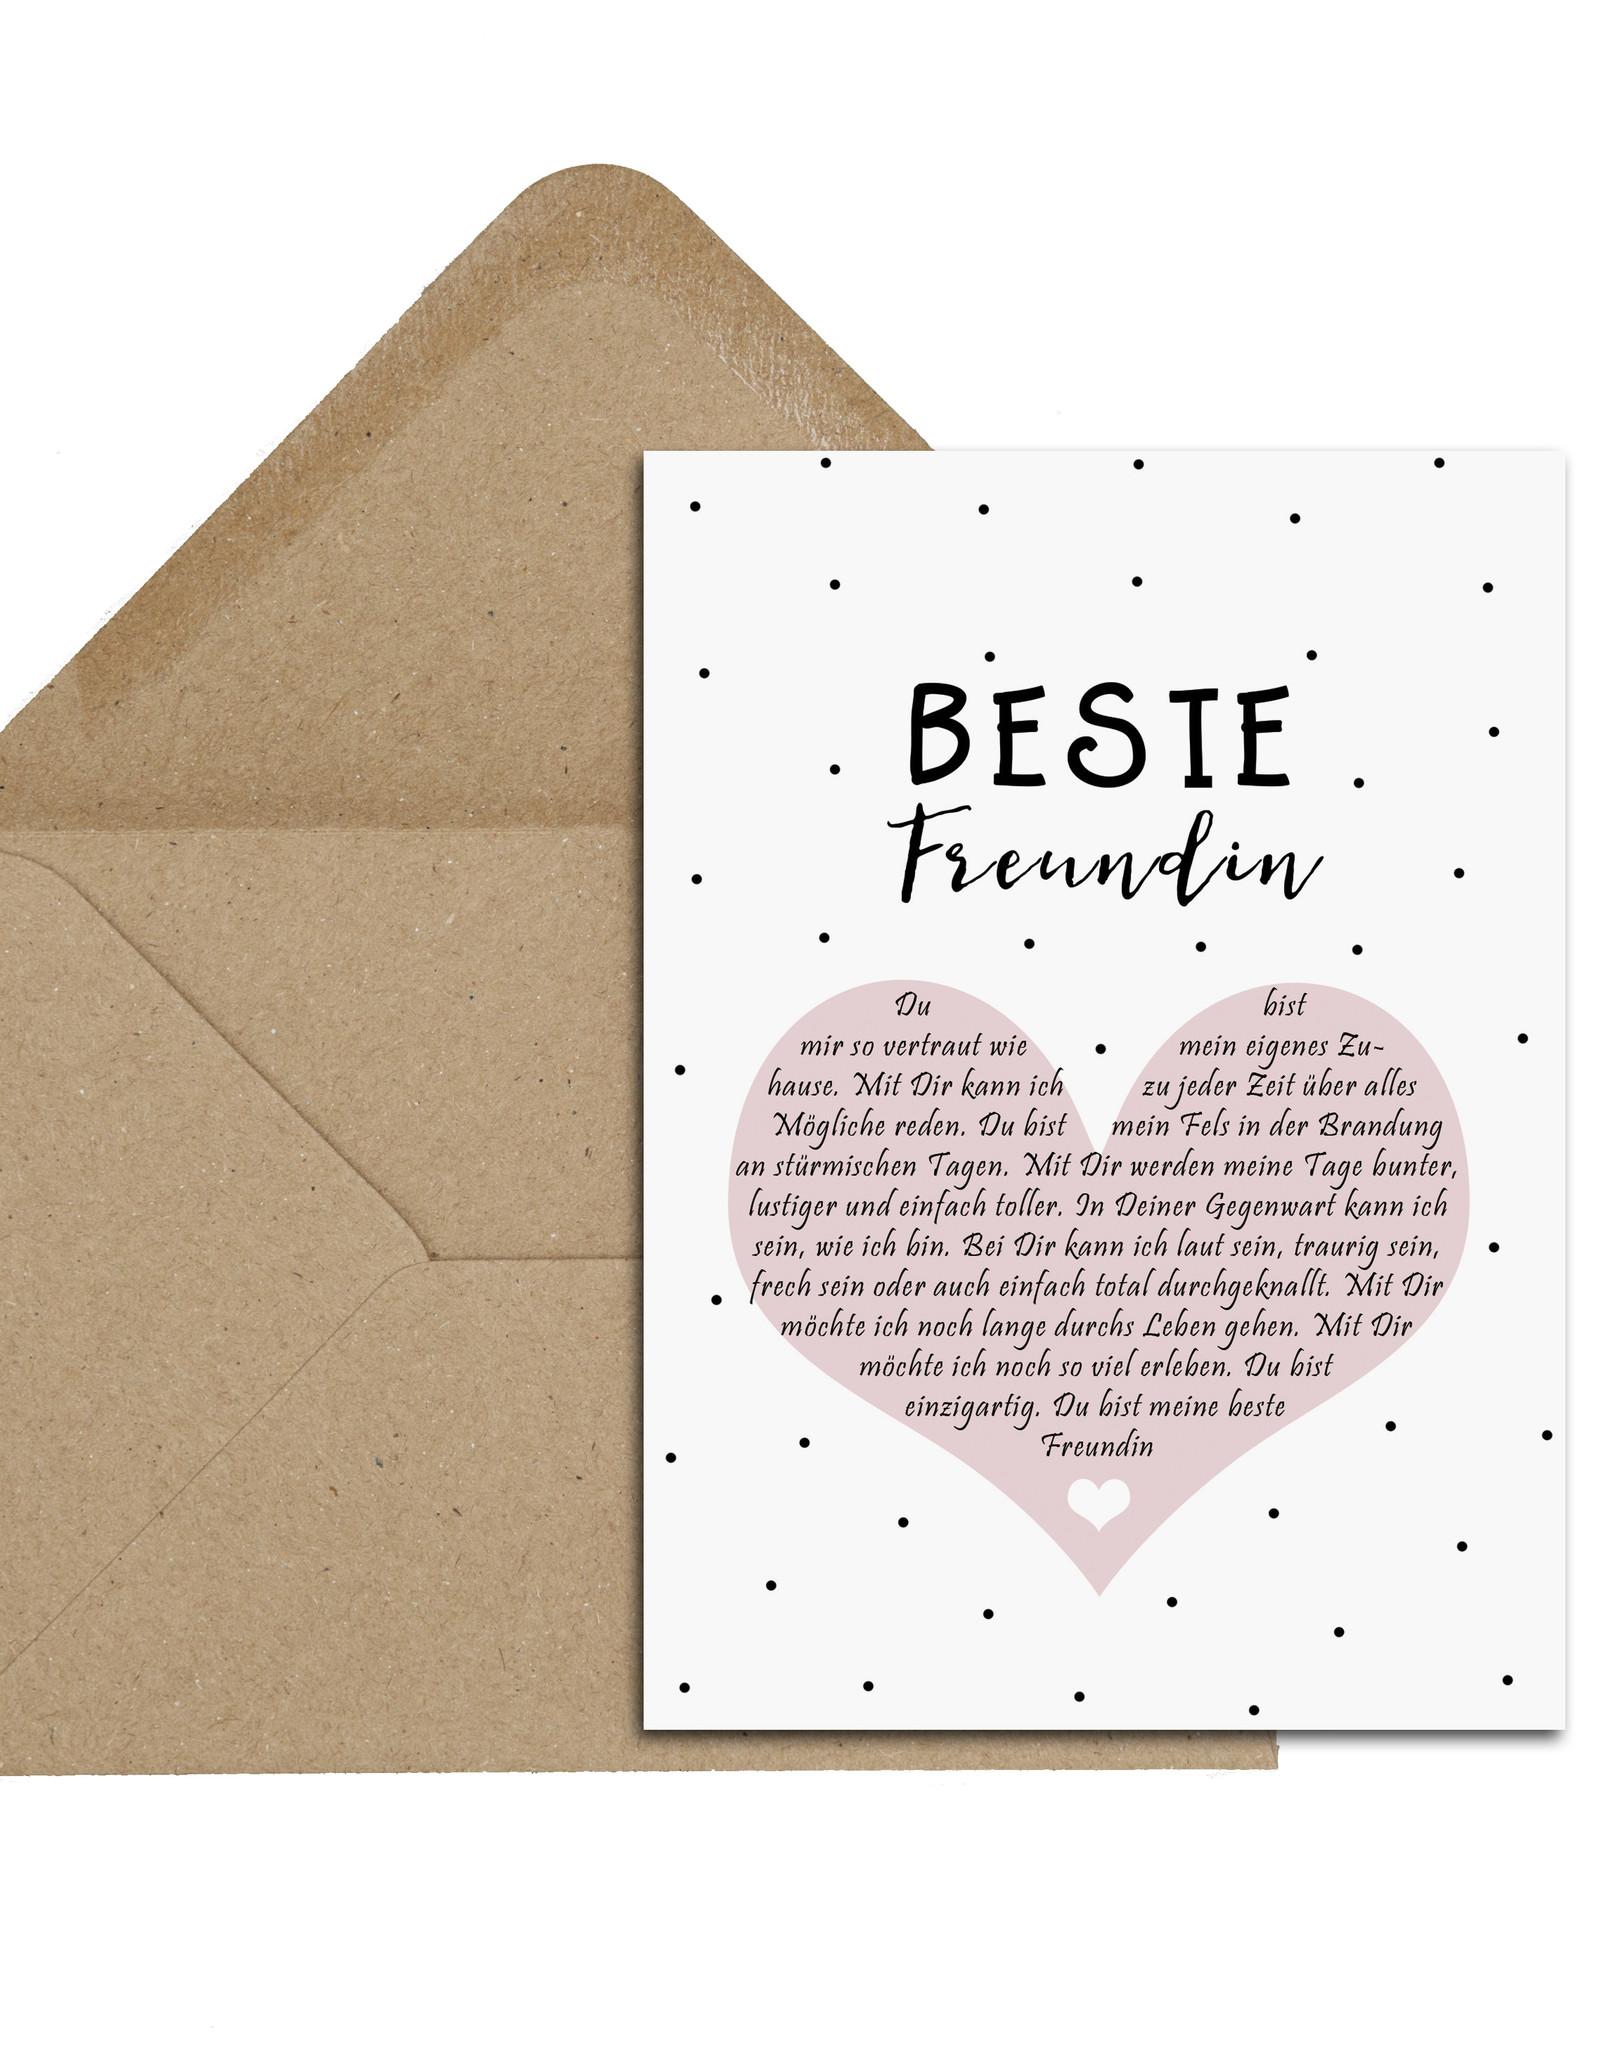 Postkarte BESTE FREUNDIN Herzbotschaft inkl. Briefumschlag Beste Freundin Geschenk